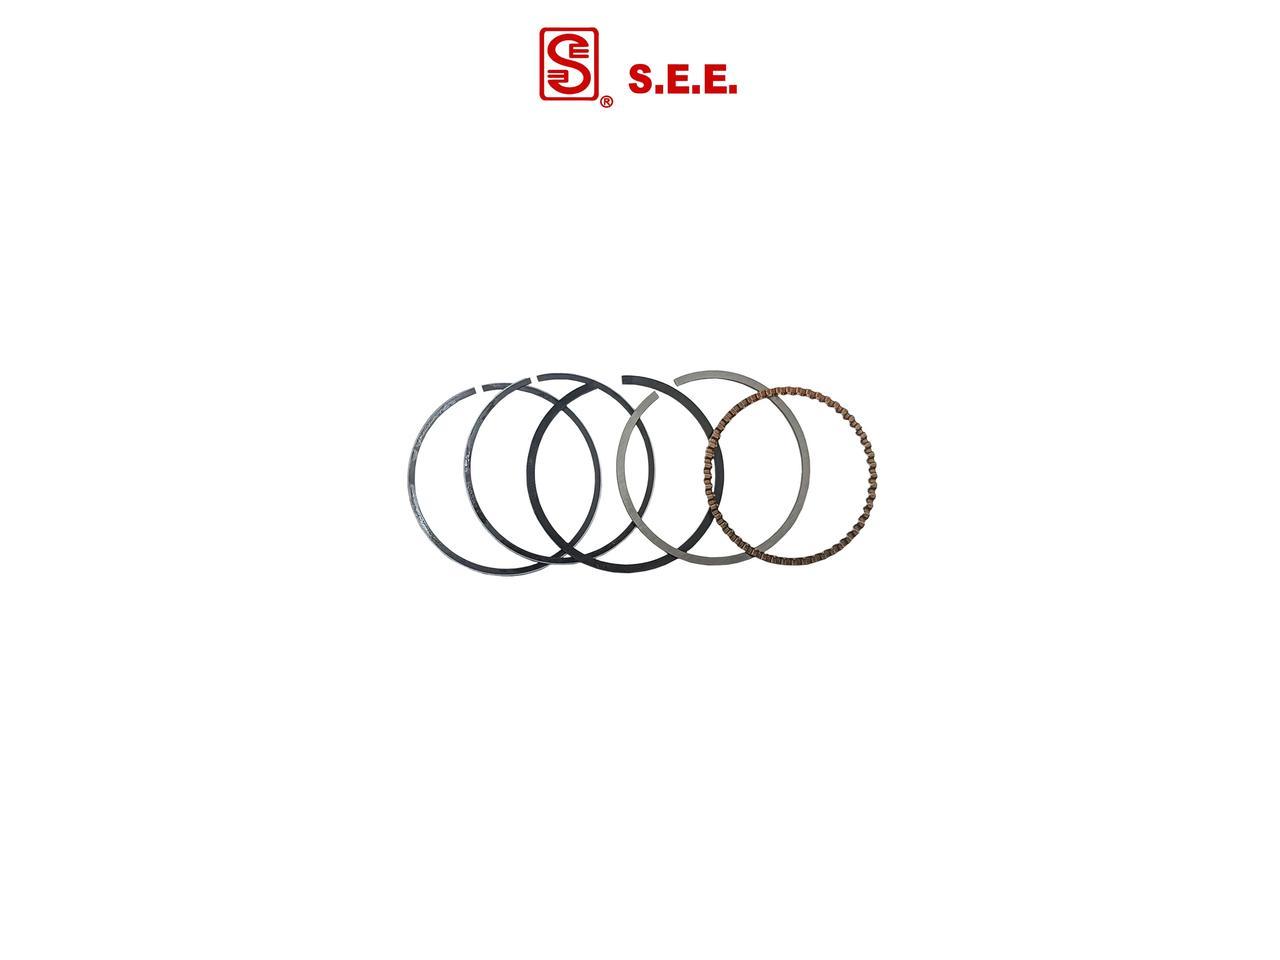 Кольца Yaben GY6 125  0.25  (Ø52.65mm)   SEE